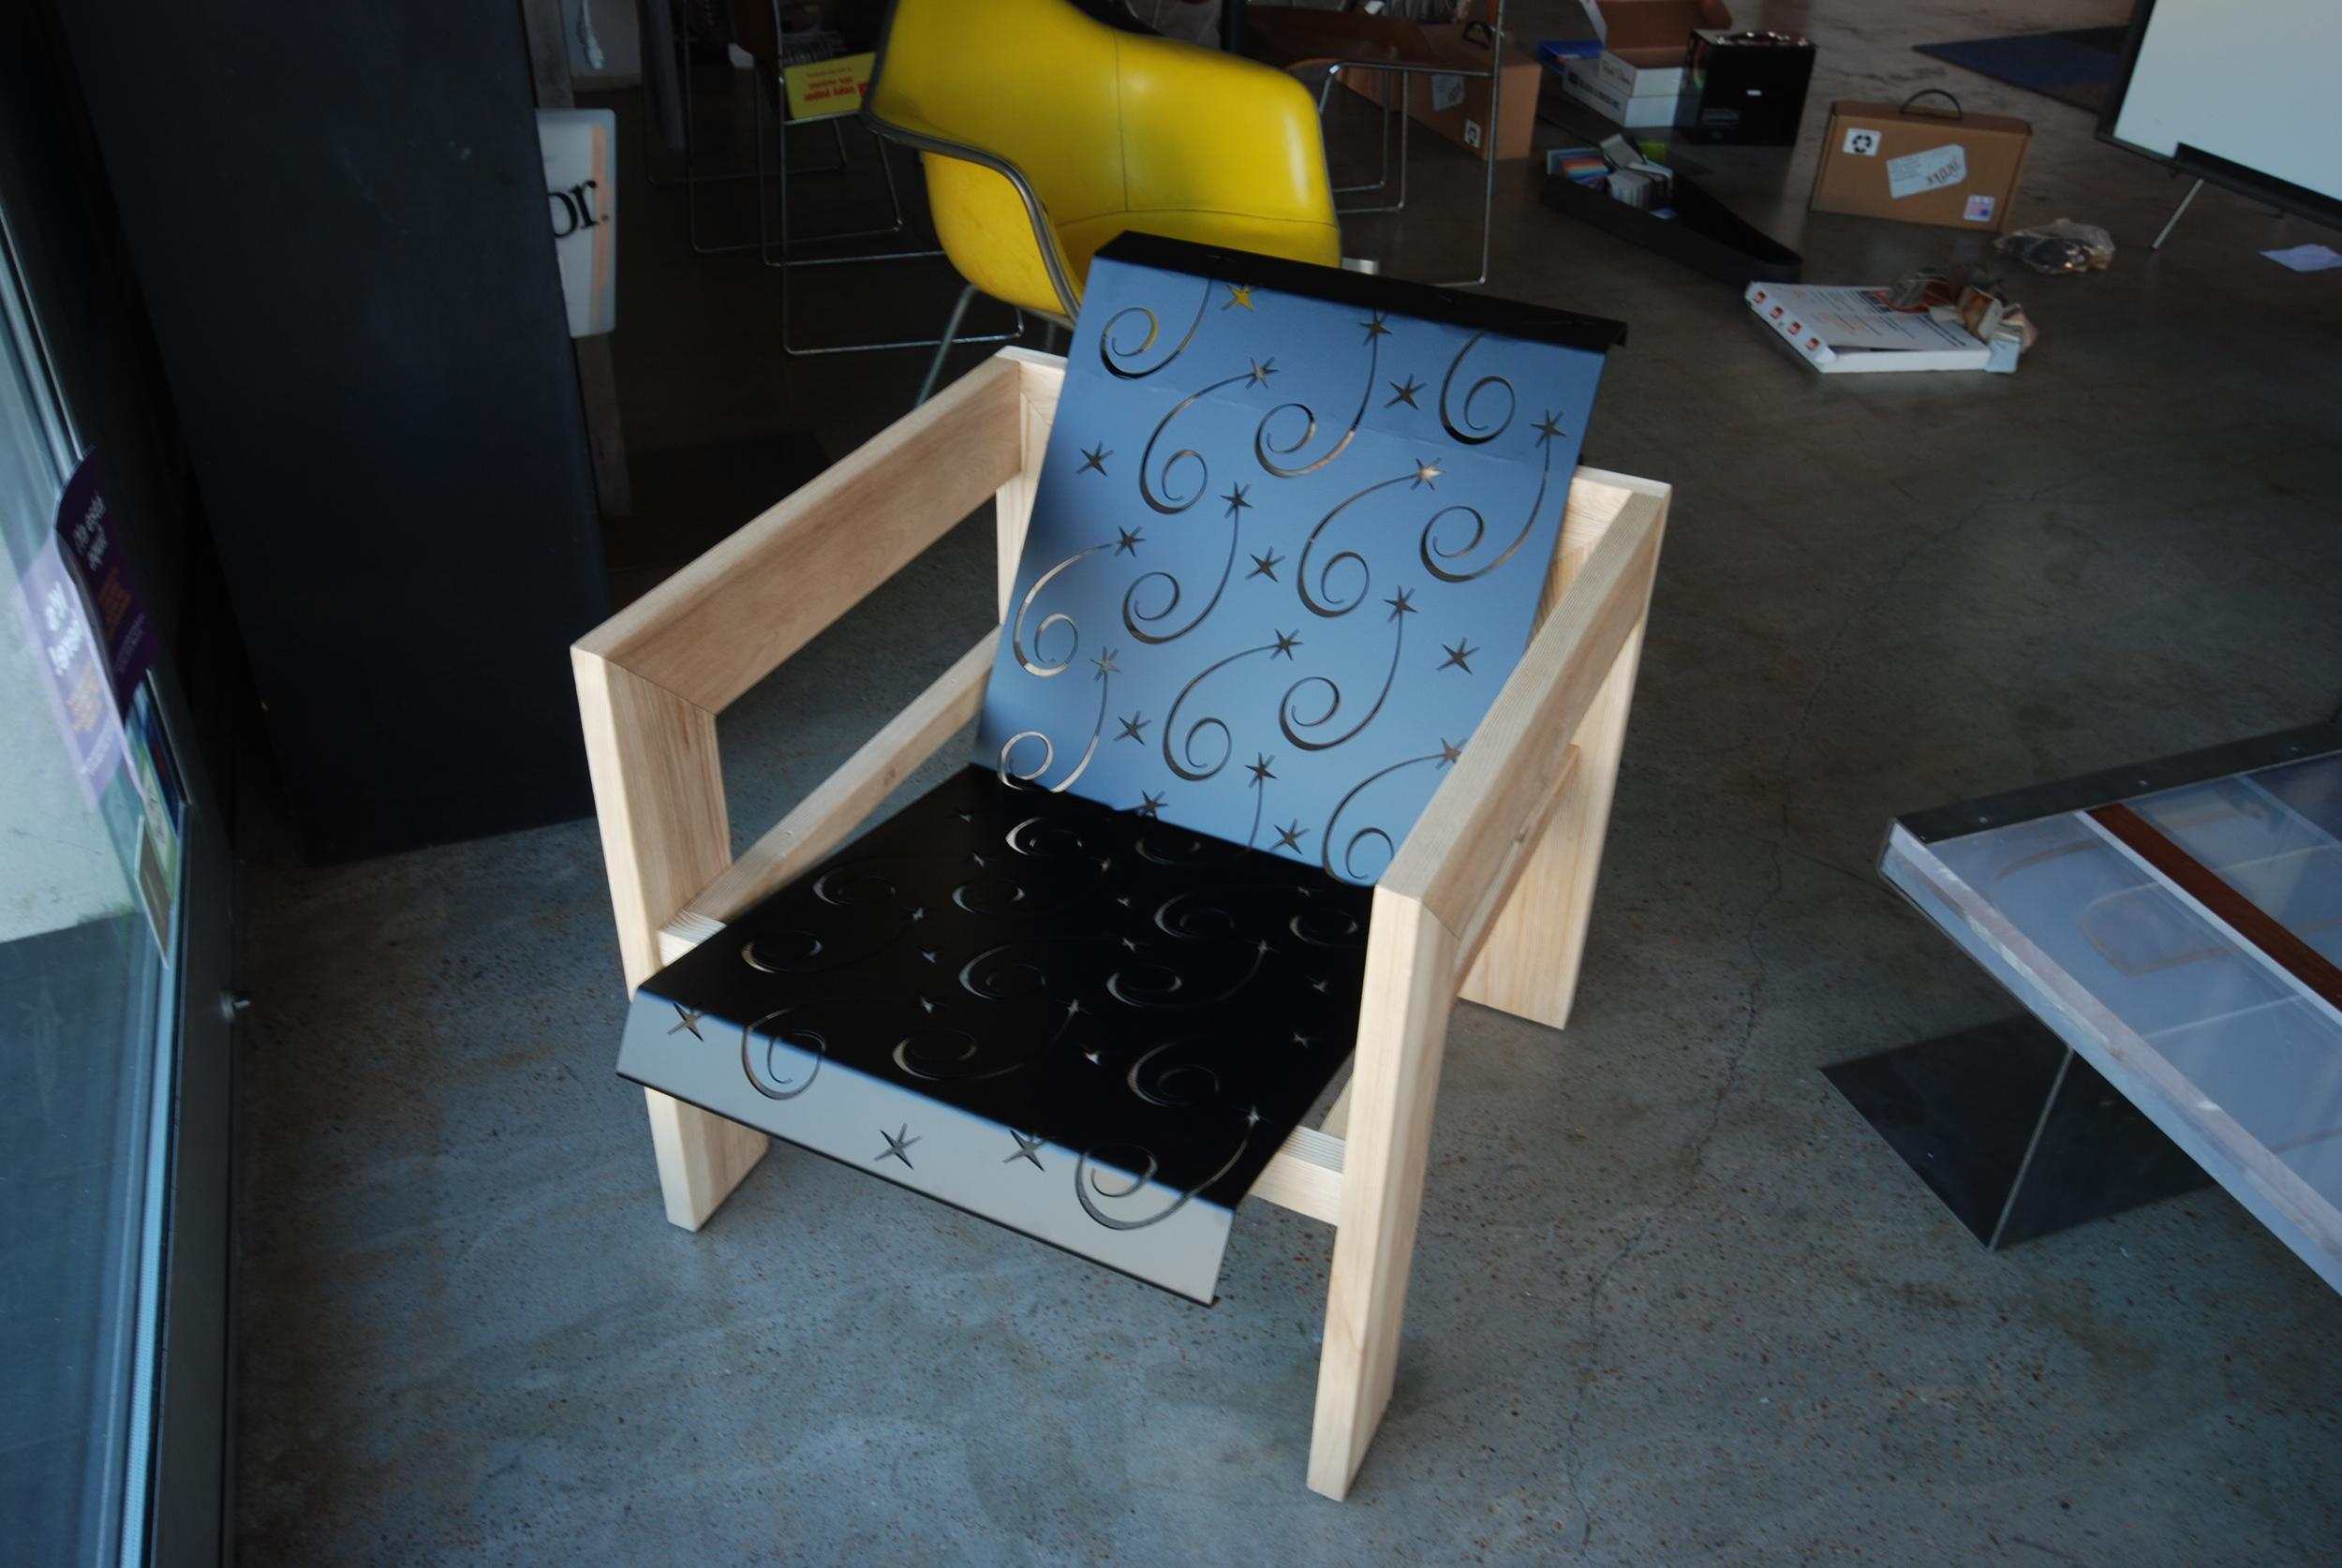 chairs for charity wish chair 02.JPG